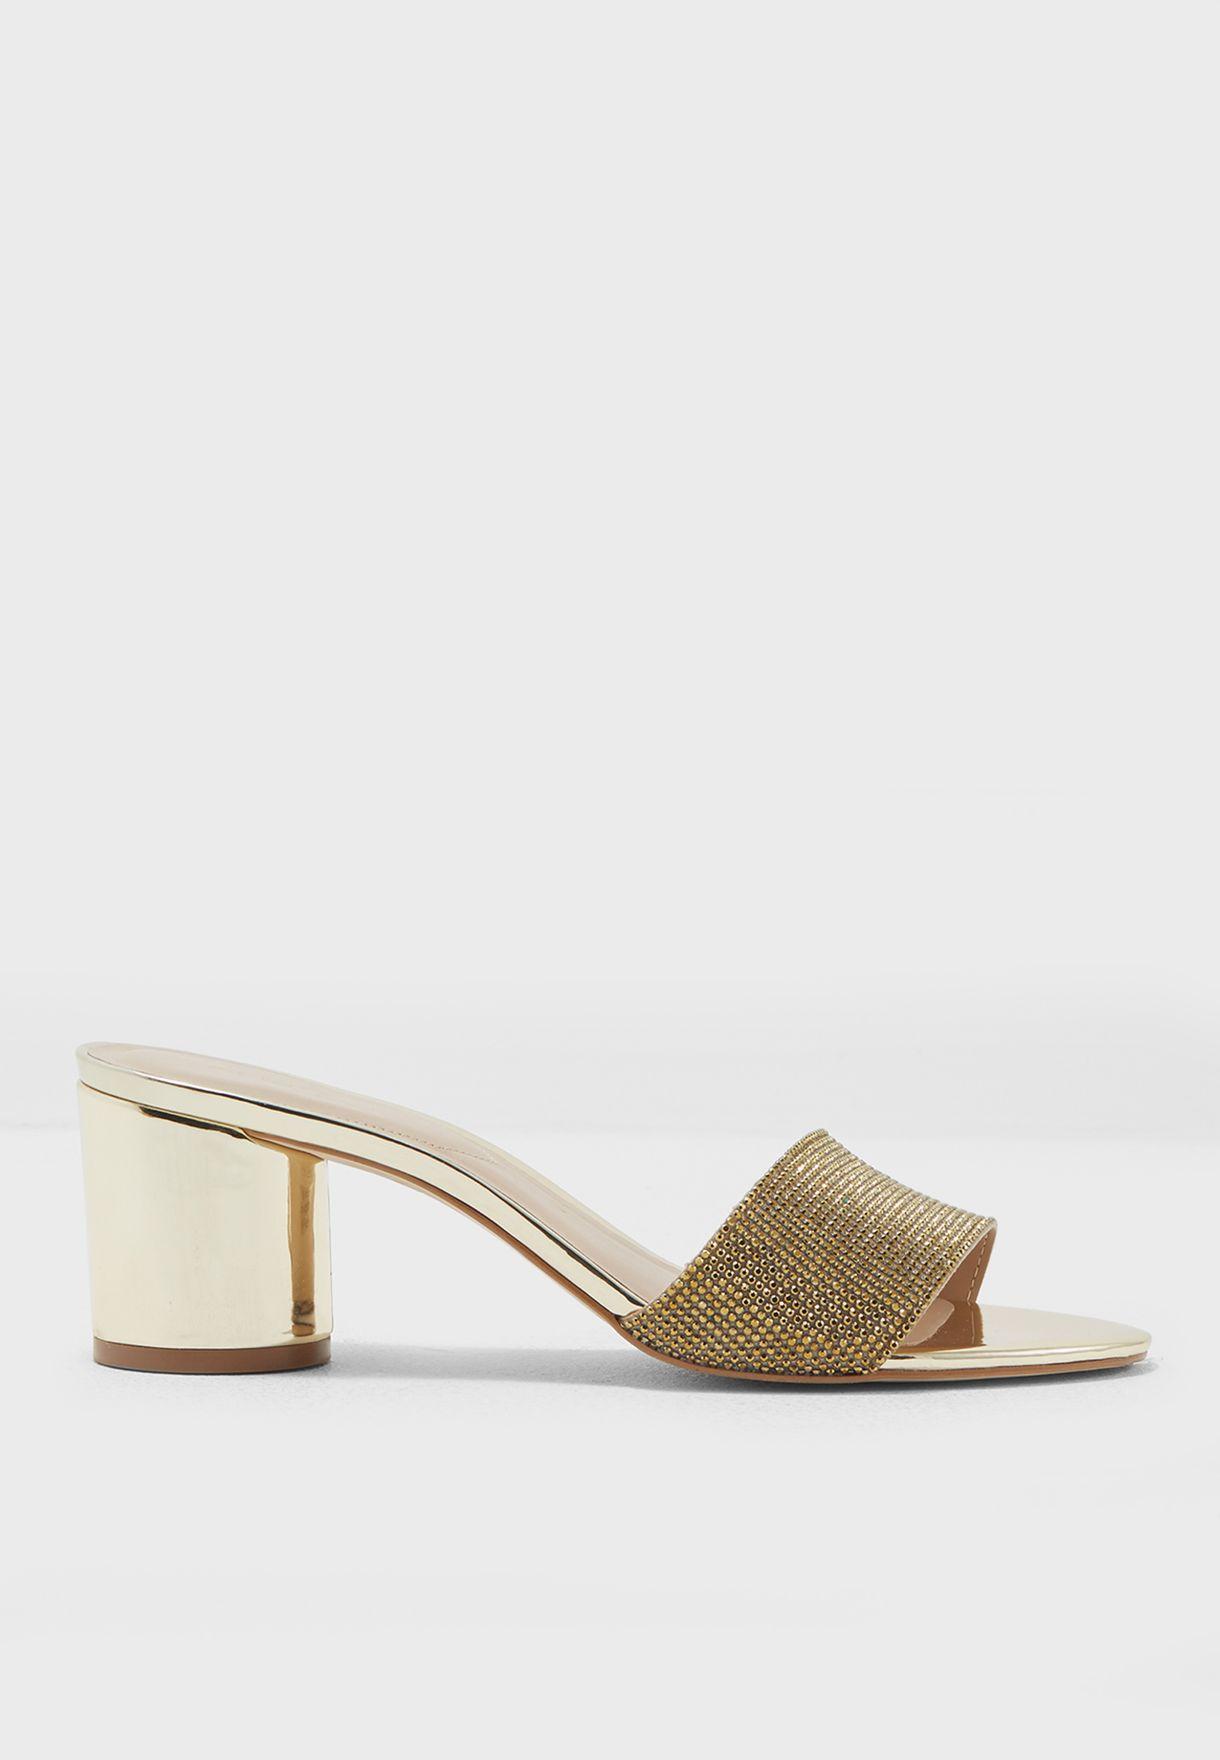 42d03dc1f0 Shop Aldo gold Mid Heel Mule Sandal COSENTINI82 for Women in Saudi ...